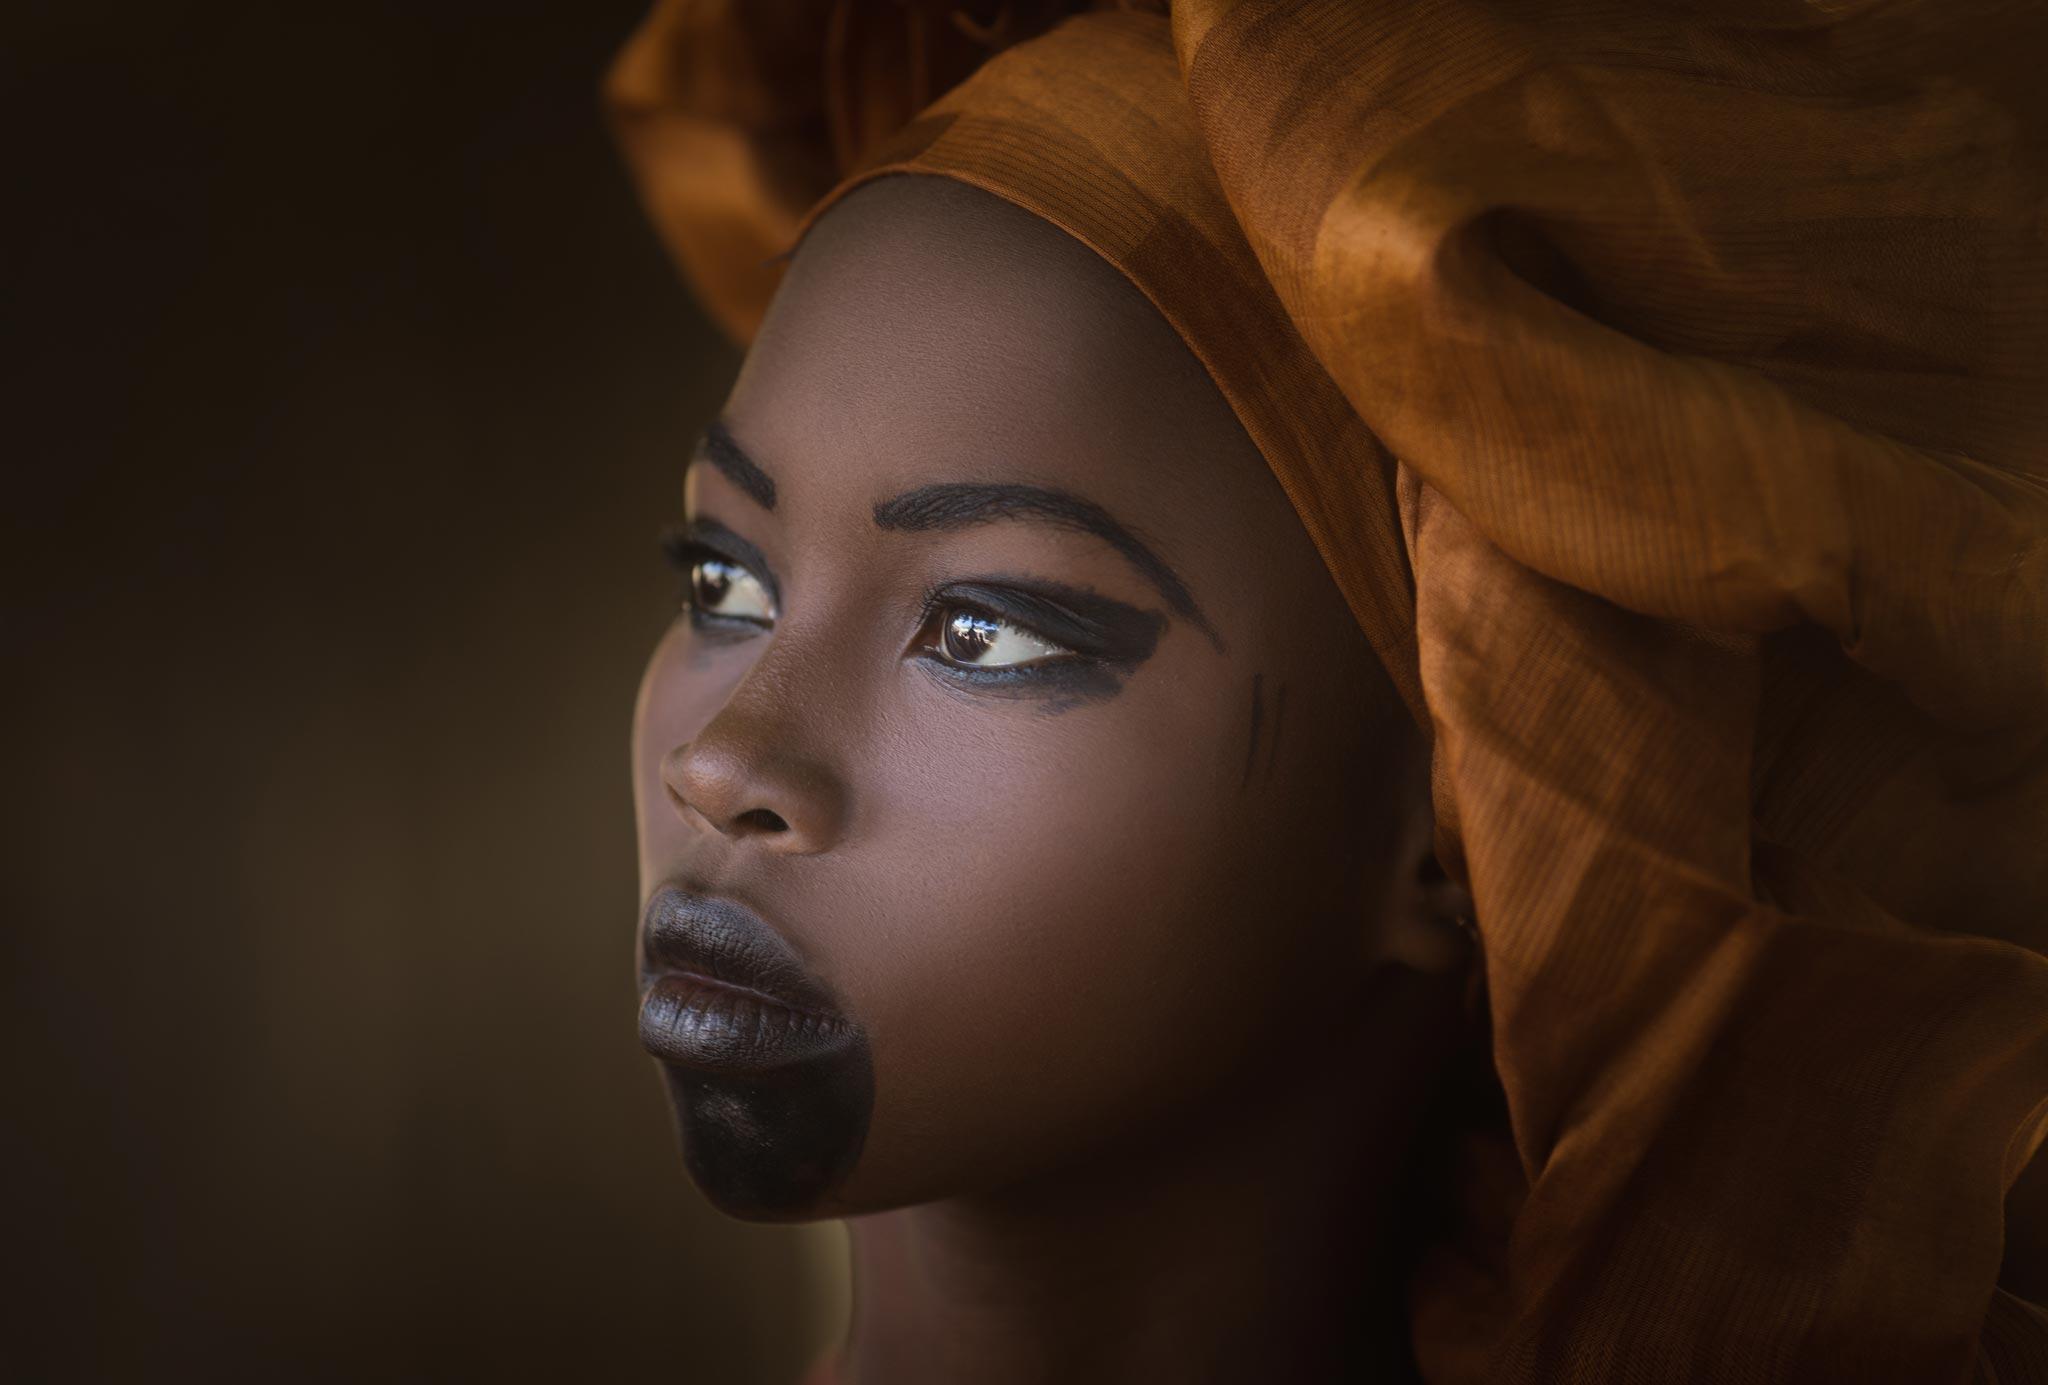 Afrika Reisefotografie